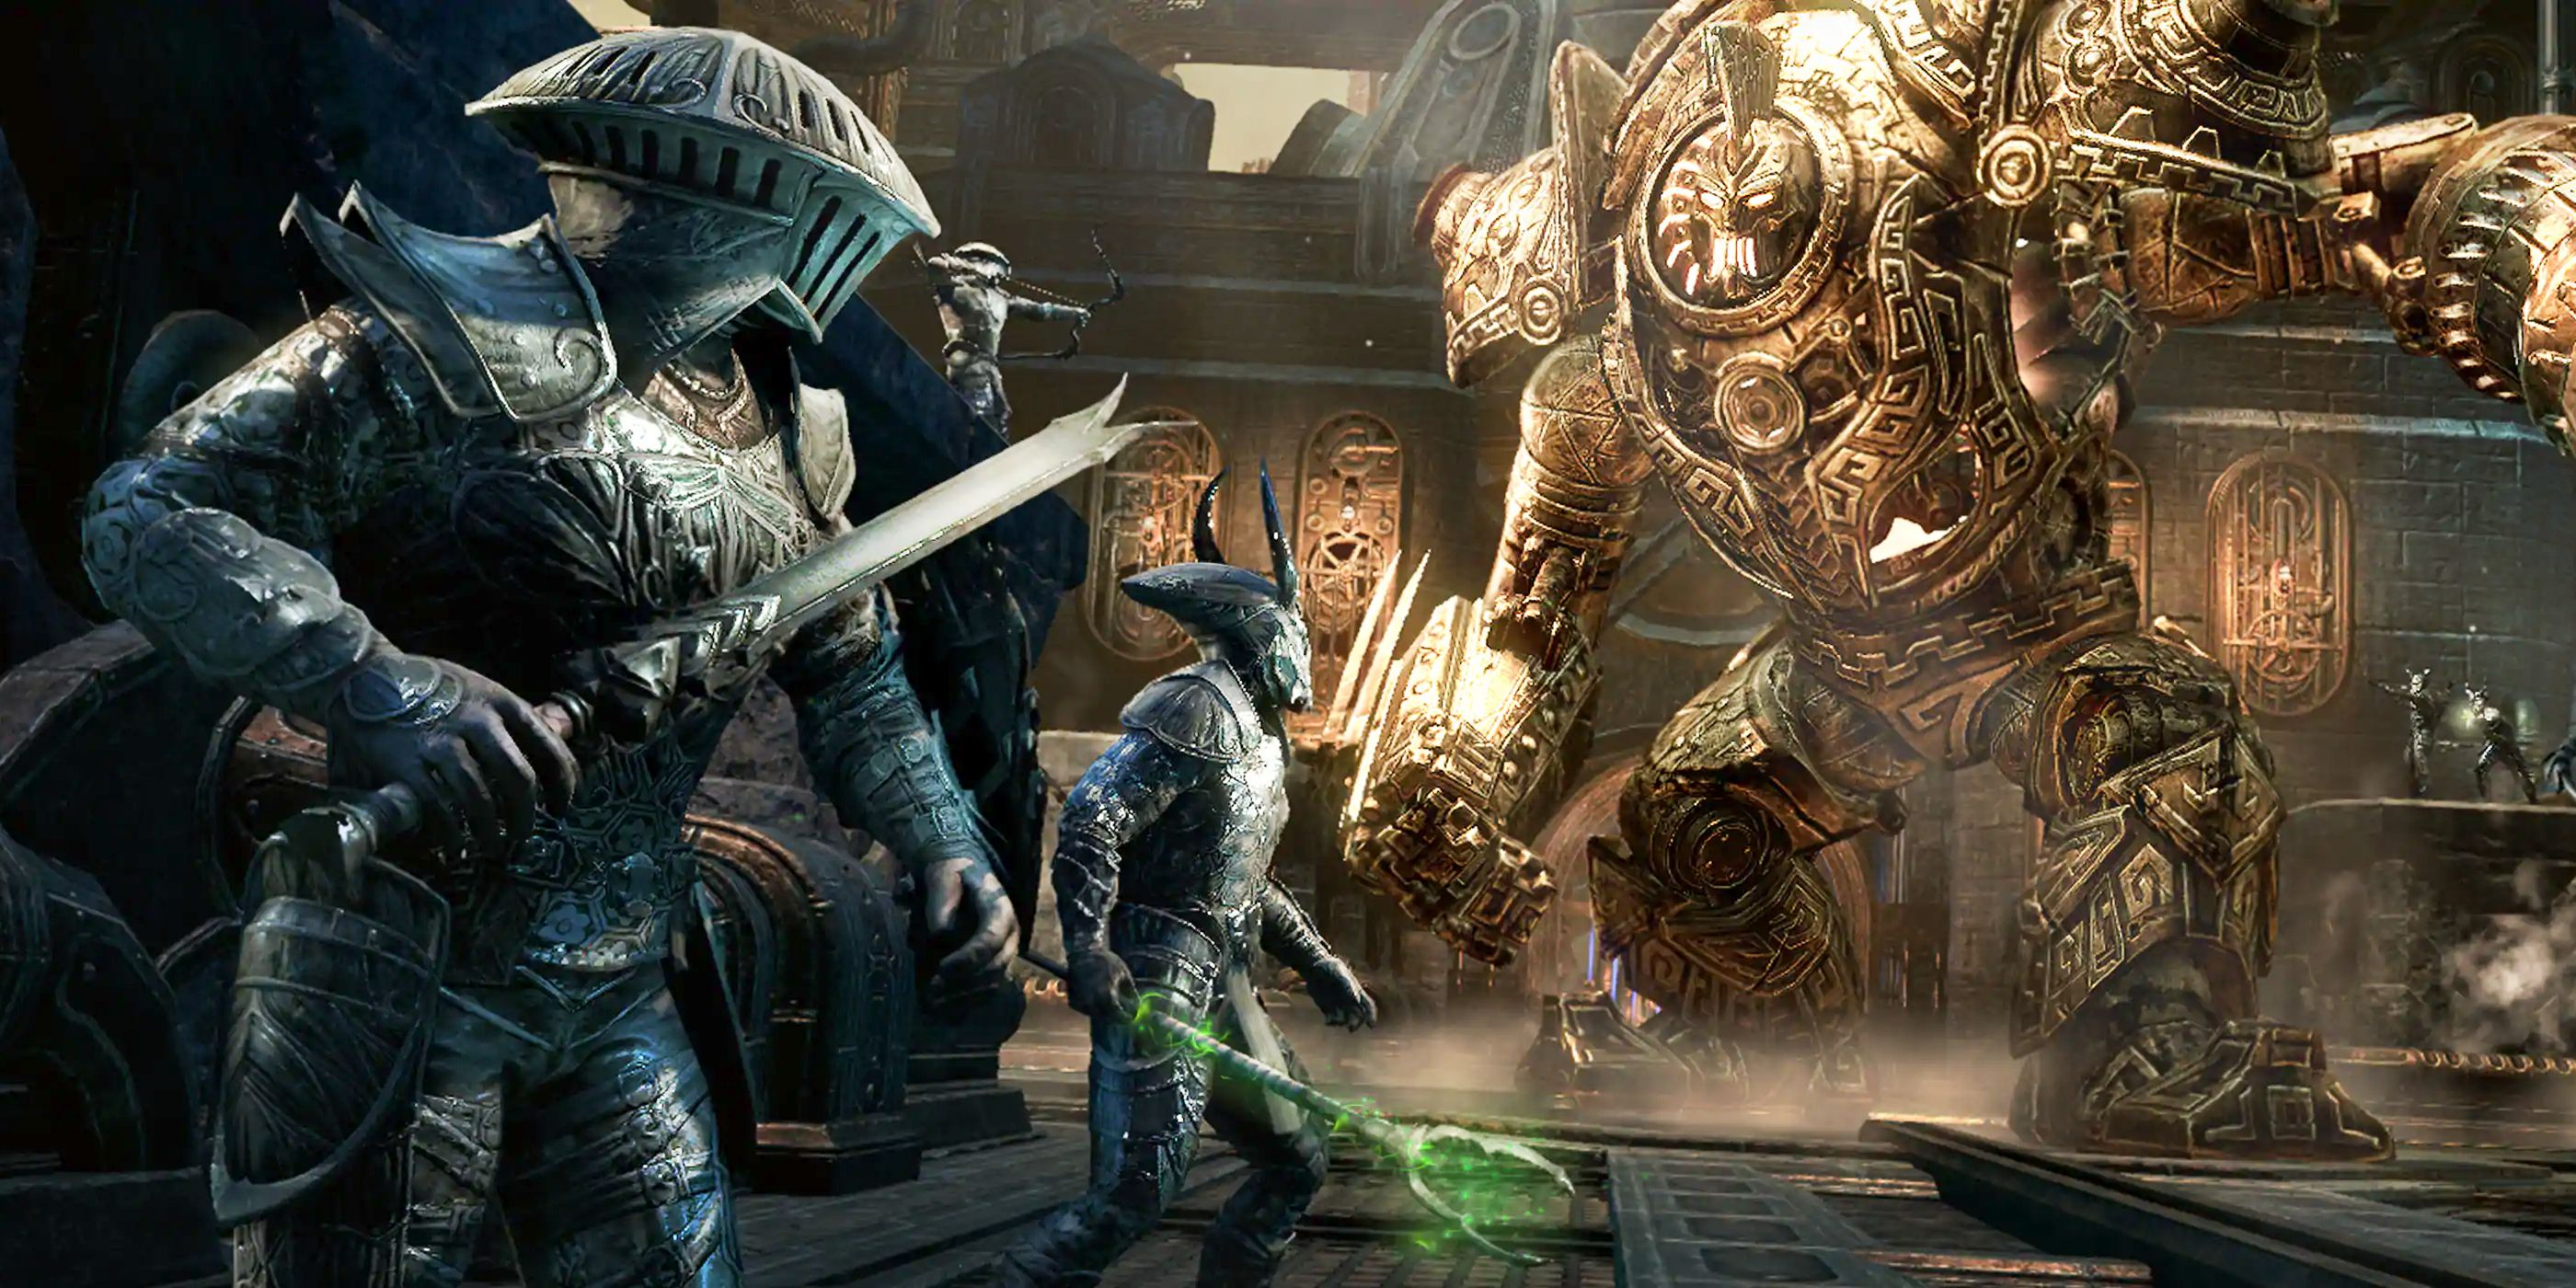 ESO Quest Order: Best Way To Play Elder Scrolls Online's Story